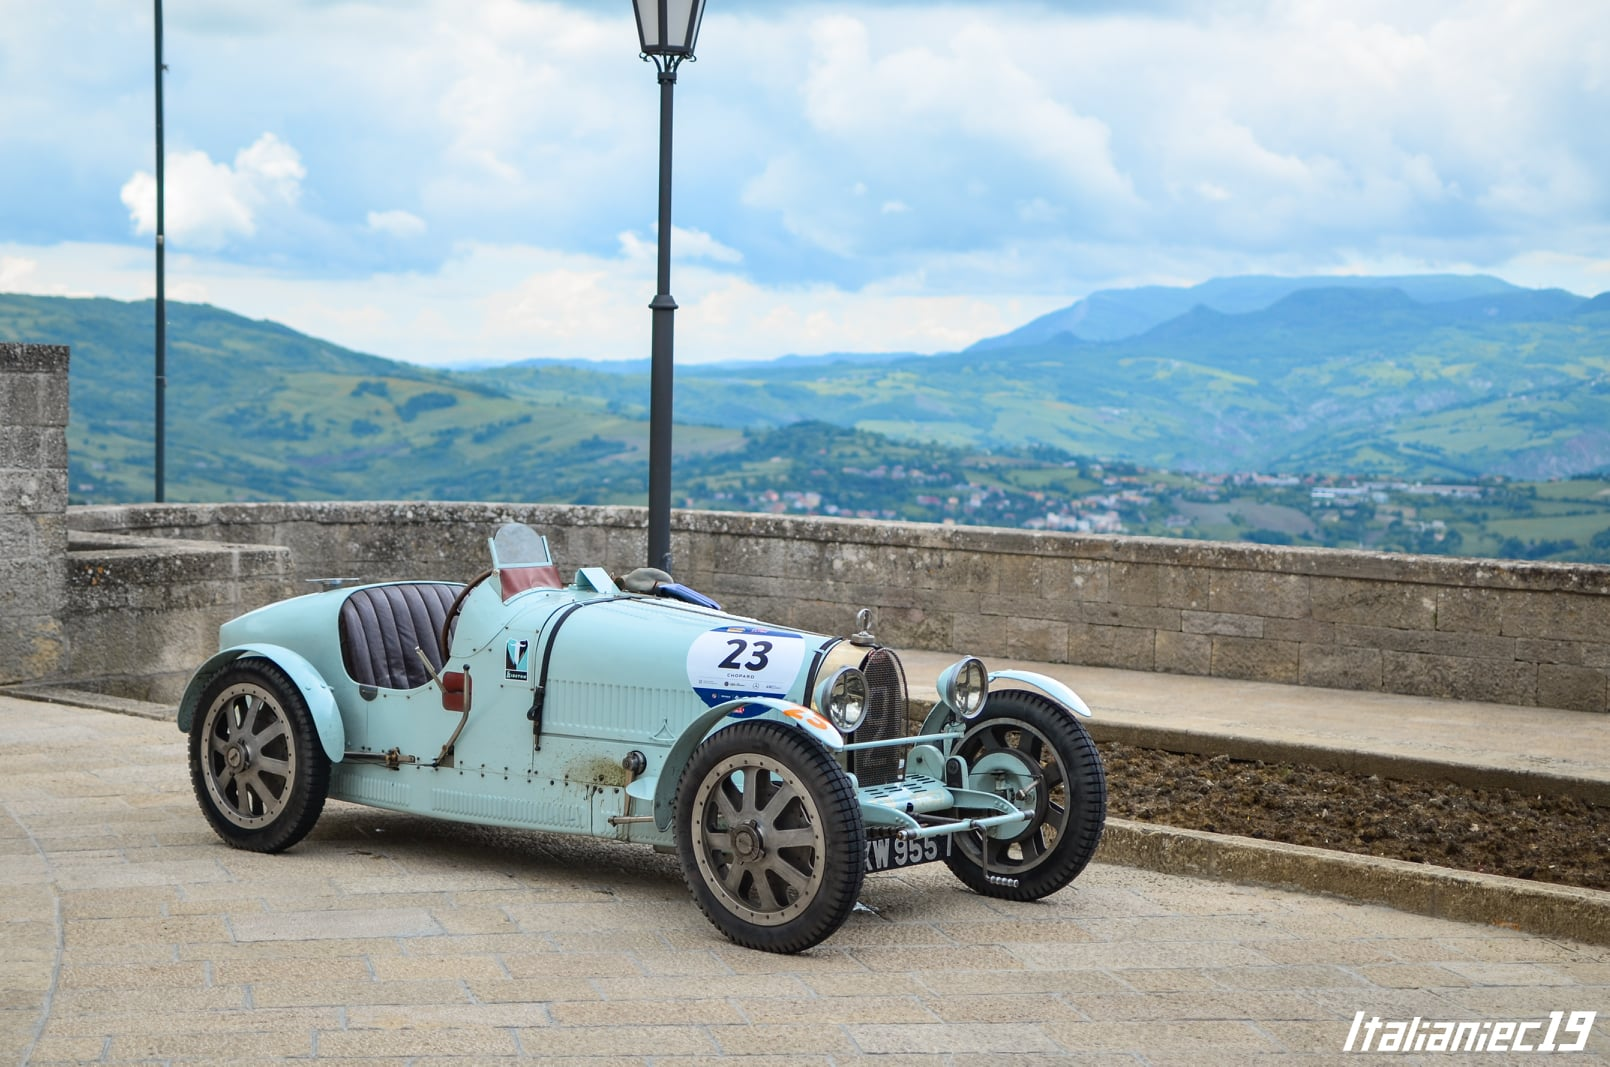 T35-Grand-Prix-van-Richard-Stanley--1925--CN-4450--XW-9557-----met-23-XXXVI-Mille-Miglia--16-19-mei-2018--Simon-Kidston--CH--Emanuele-Collo